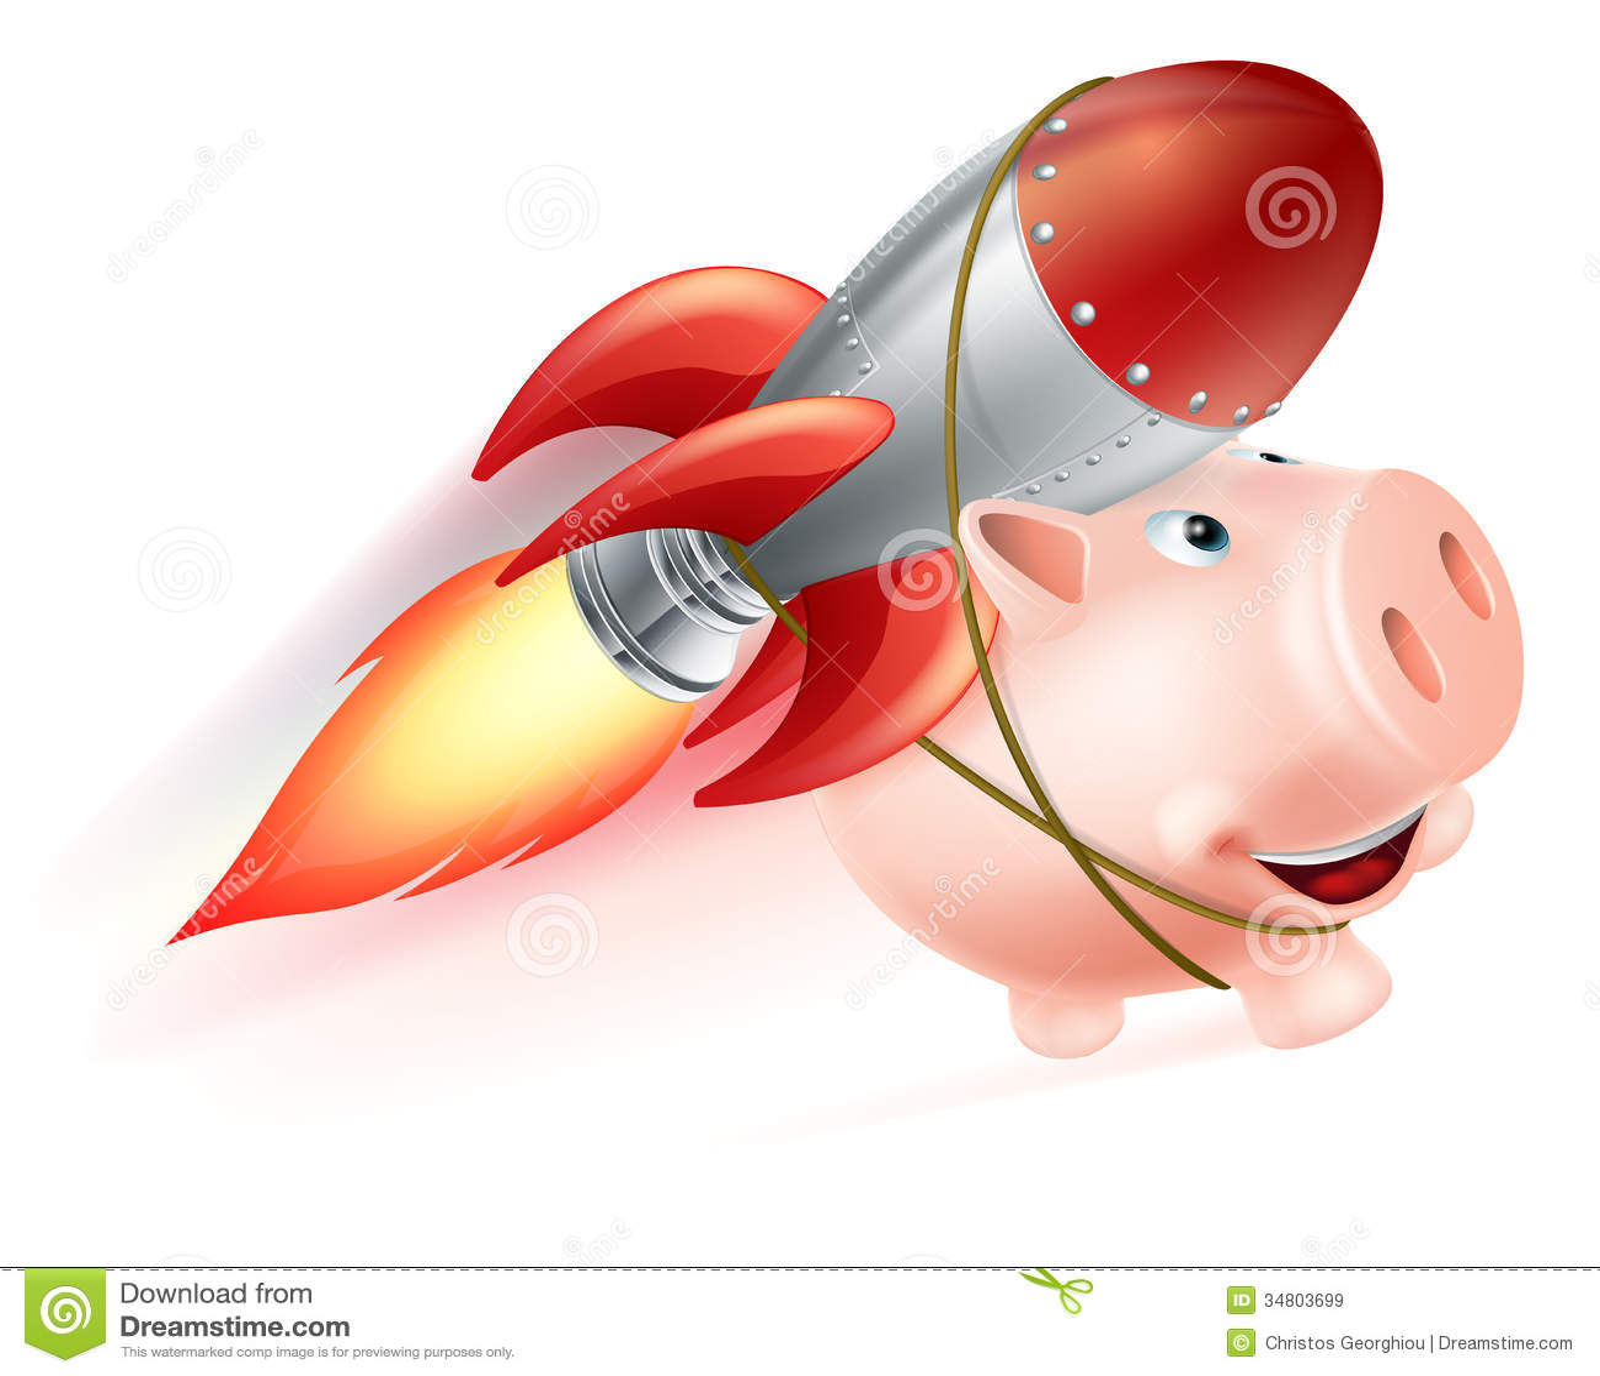 Rocket piggy bank royalty free stock images image 34803699 - Rocket piggy bank ...